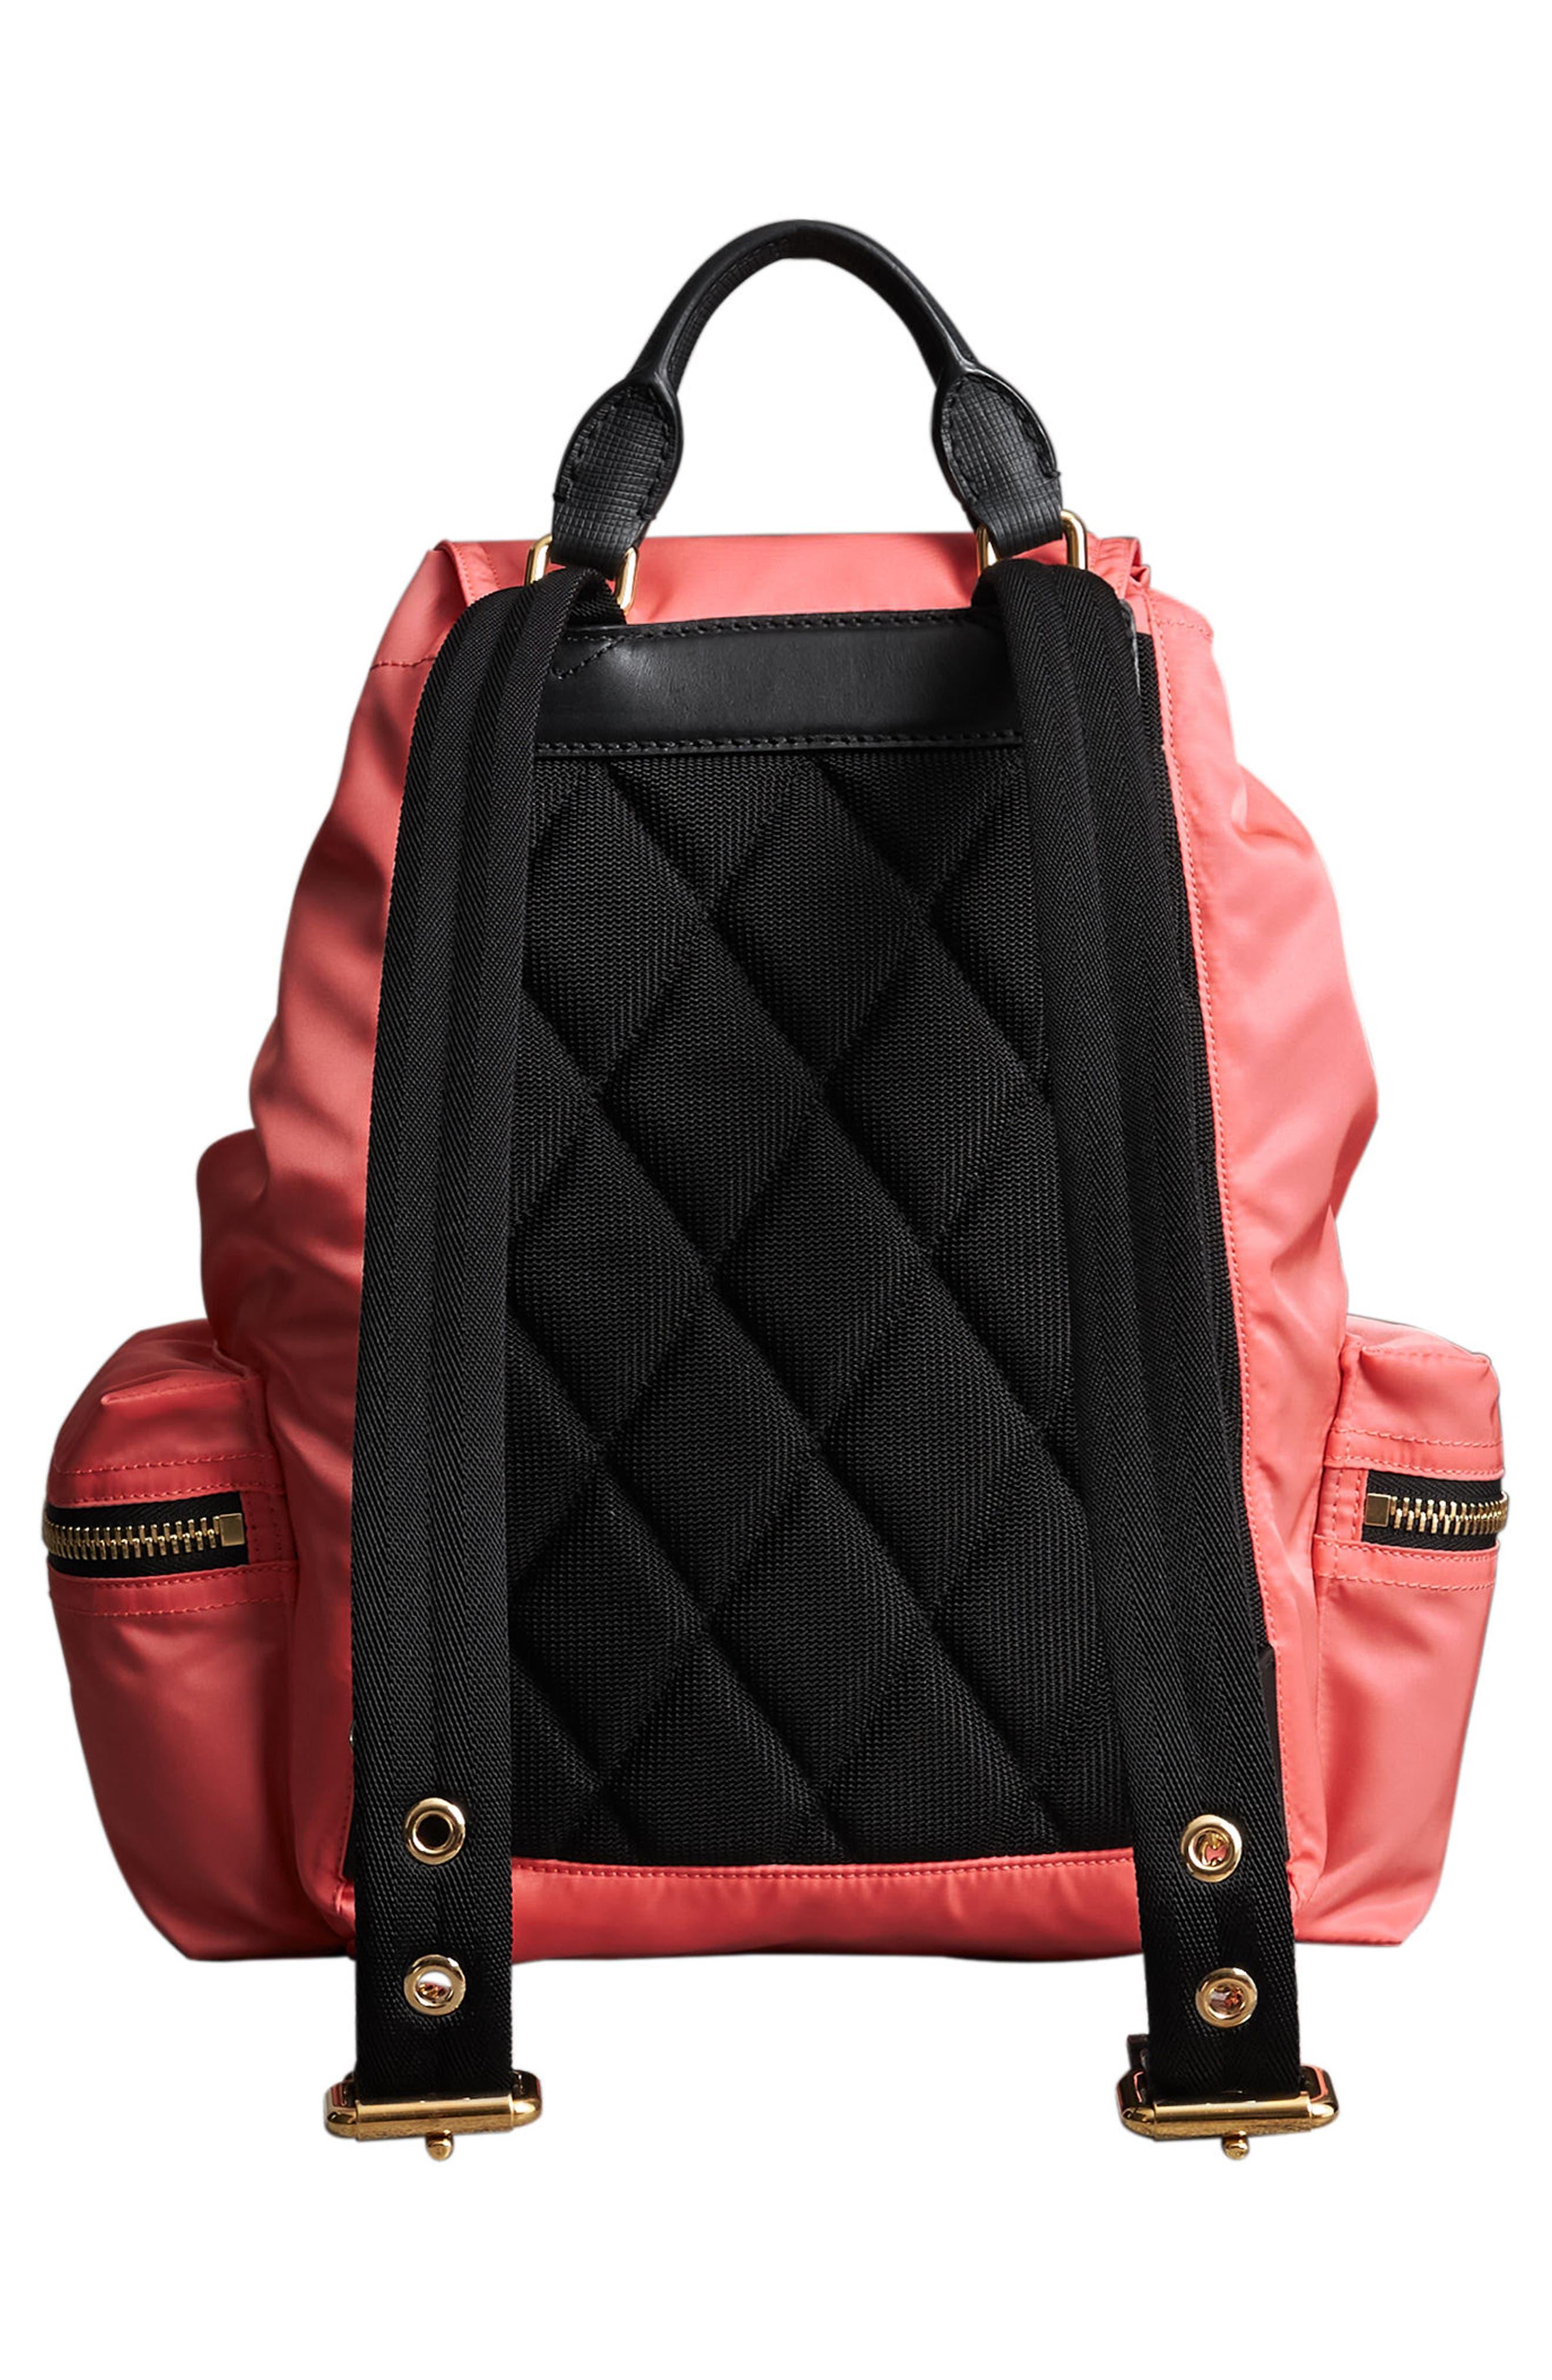 Medium Rucksack Nylon Backpack,                             Alternate thumbnail 2, color,                             Bright Coral Pink